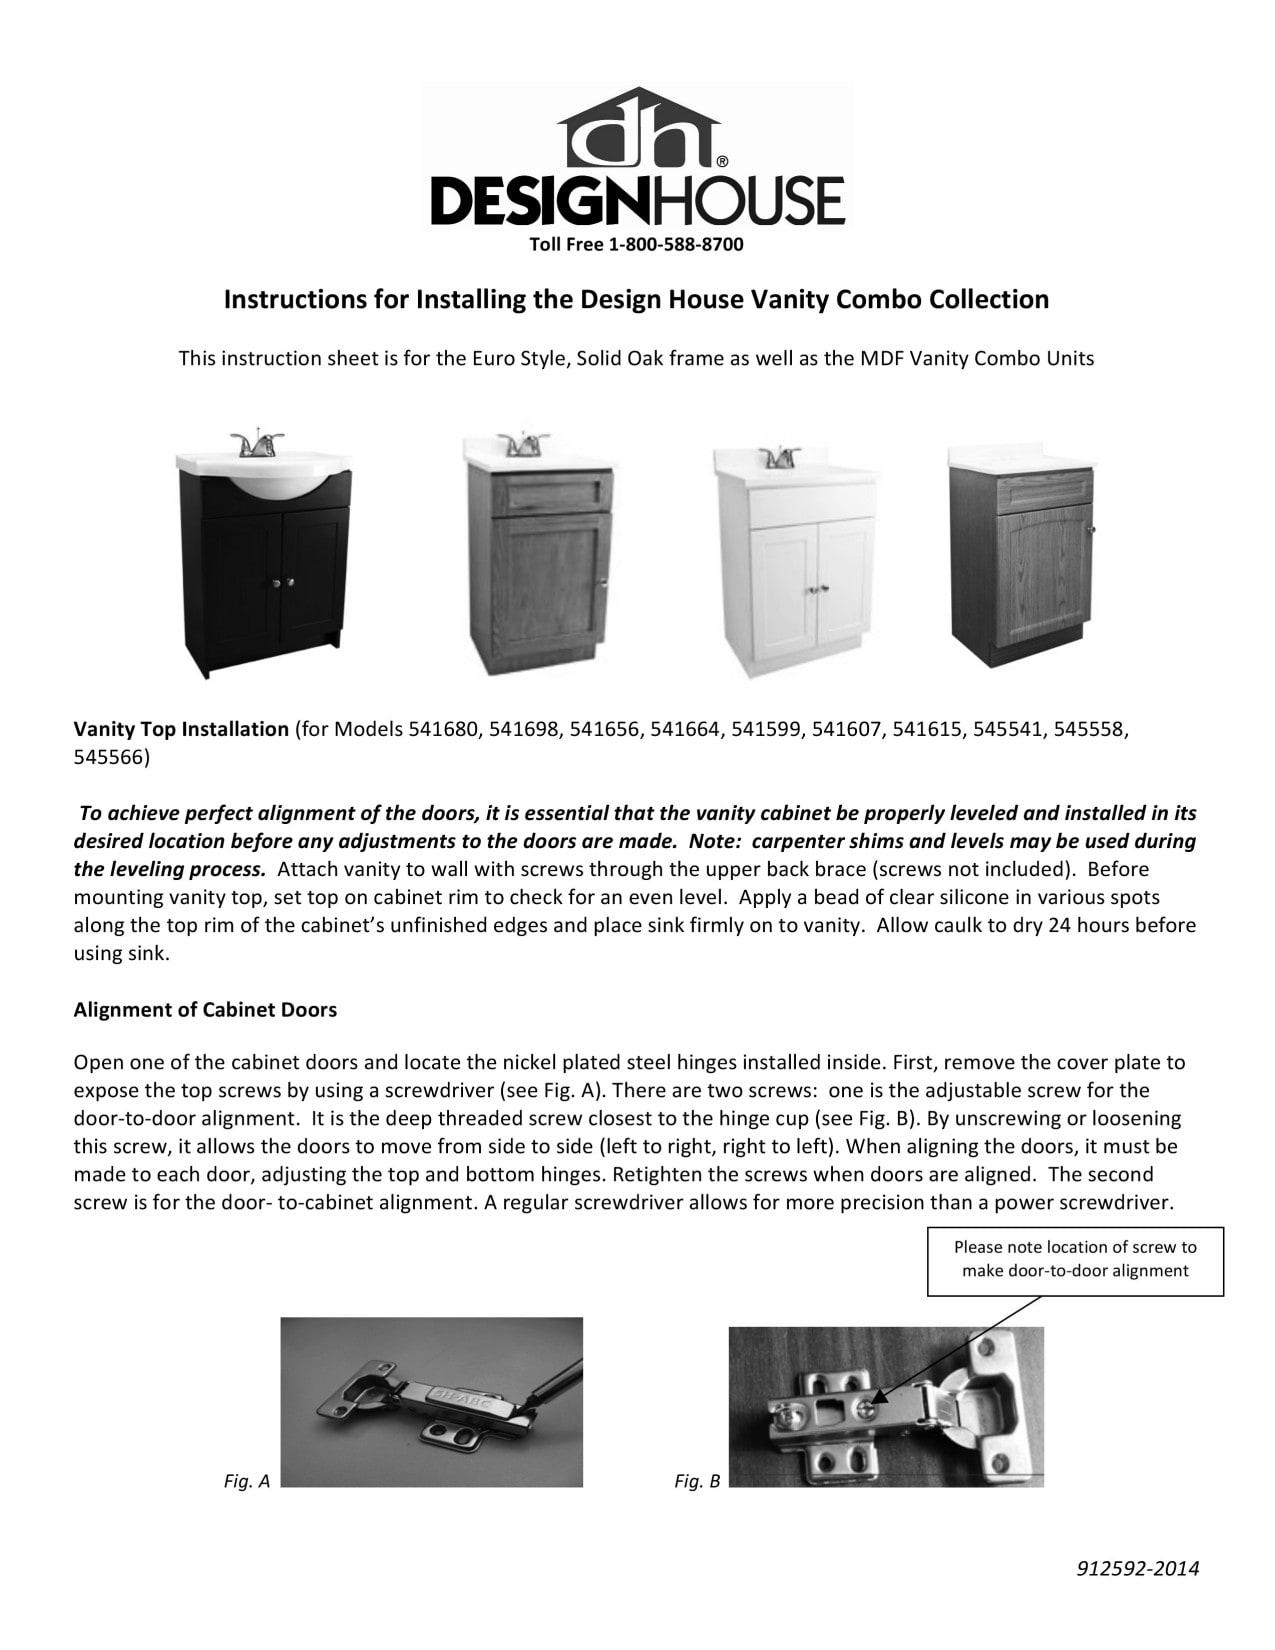 Bathroom Vanities Tools Home Improvement Design House 541607 Vanity Combo White Vanity Bathroom Cabinet With 2 Doors 25 Inch By 19 Inch By 31 5 Inch